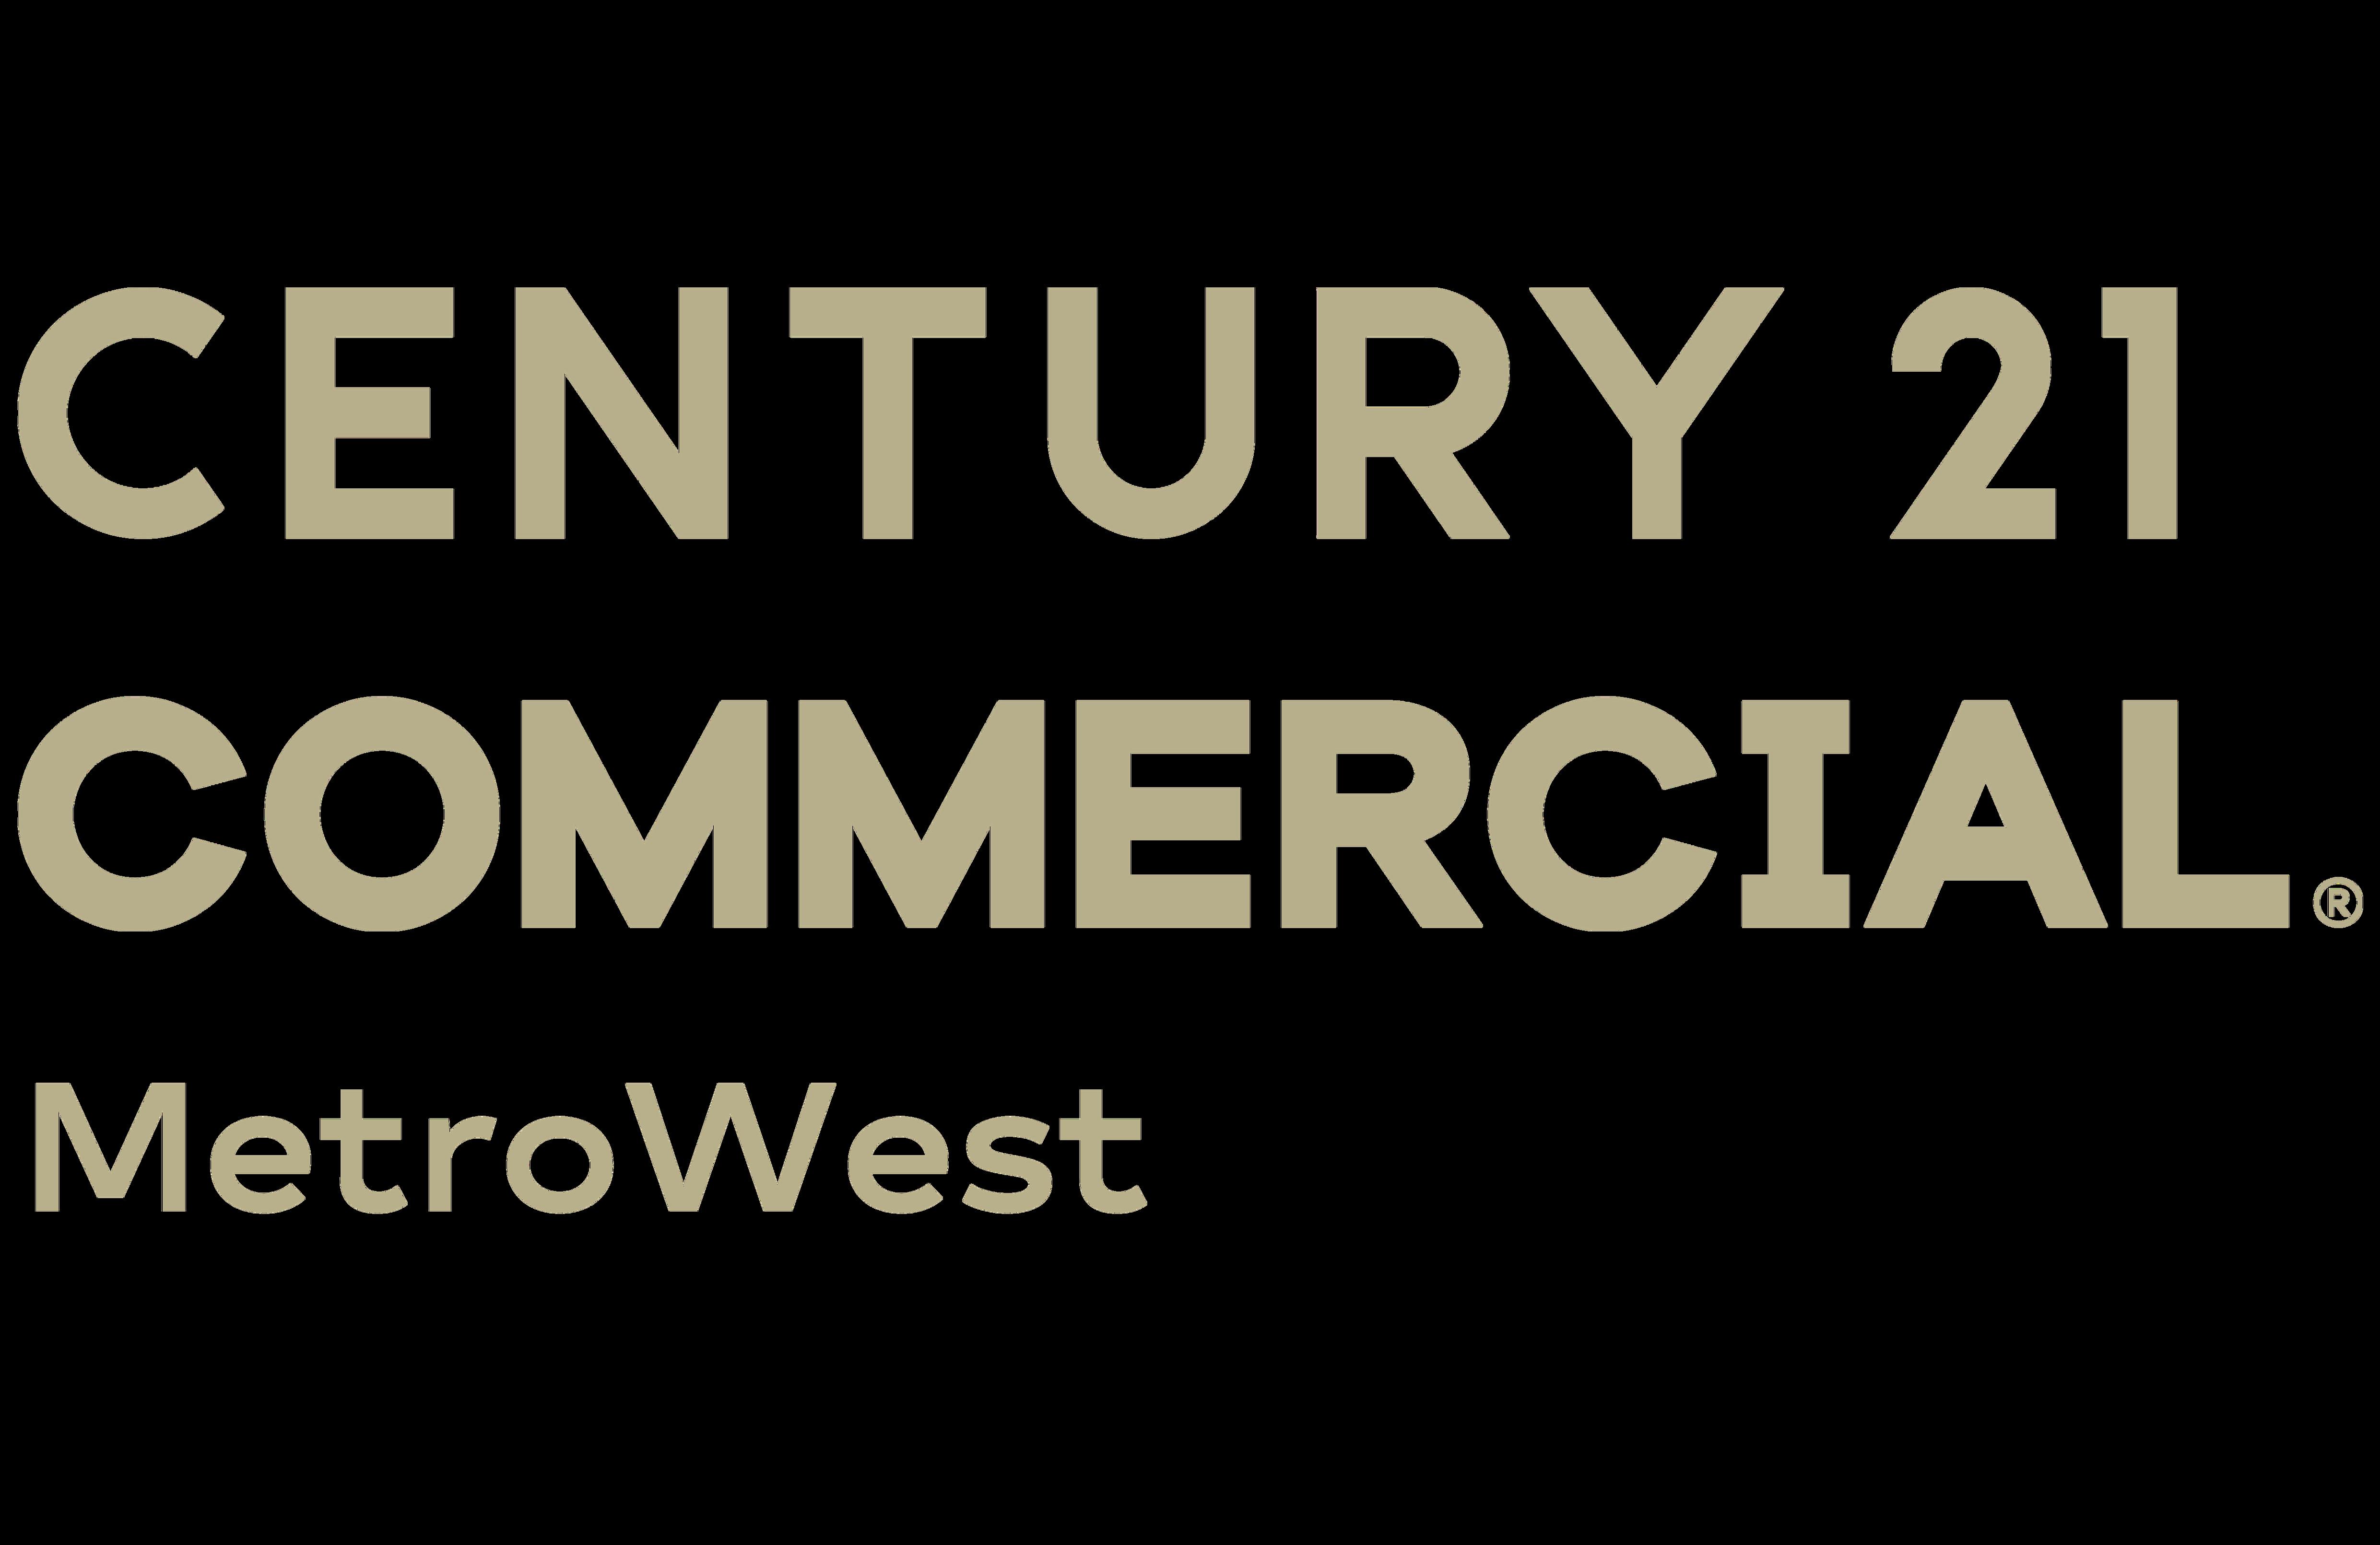 Miller Real Estate Experts of CENTURY 21 MetroWest logo